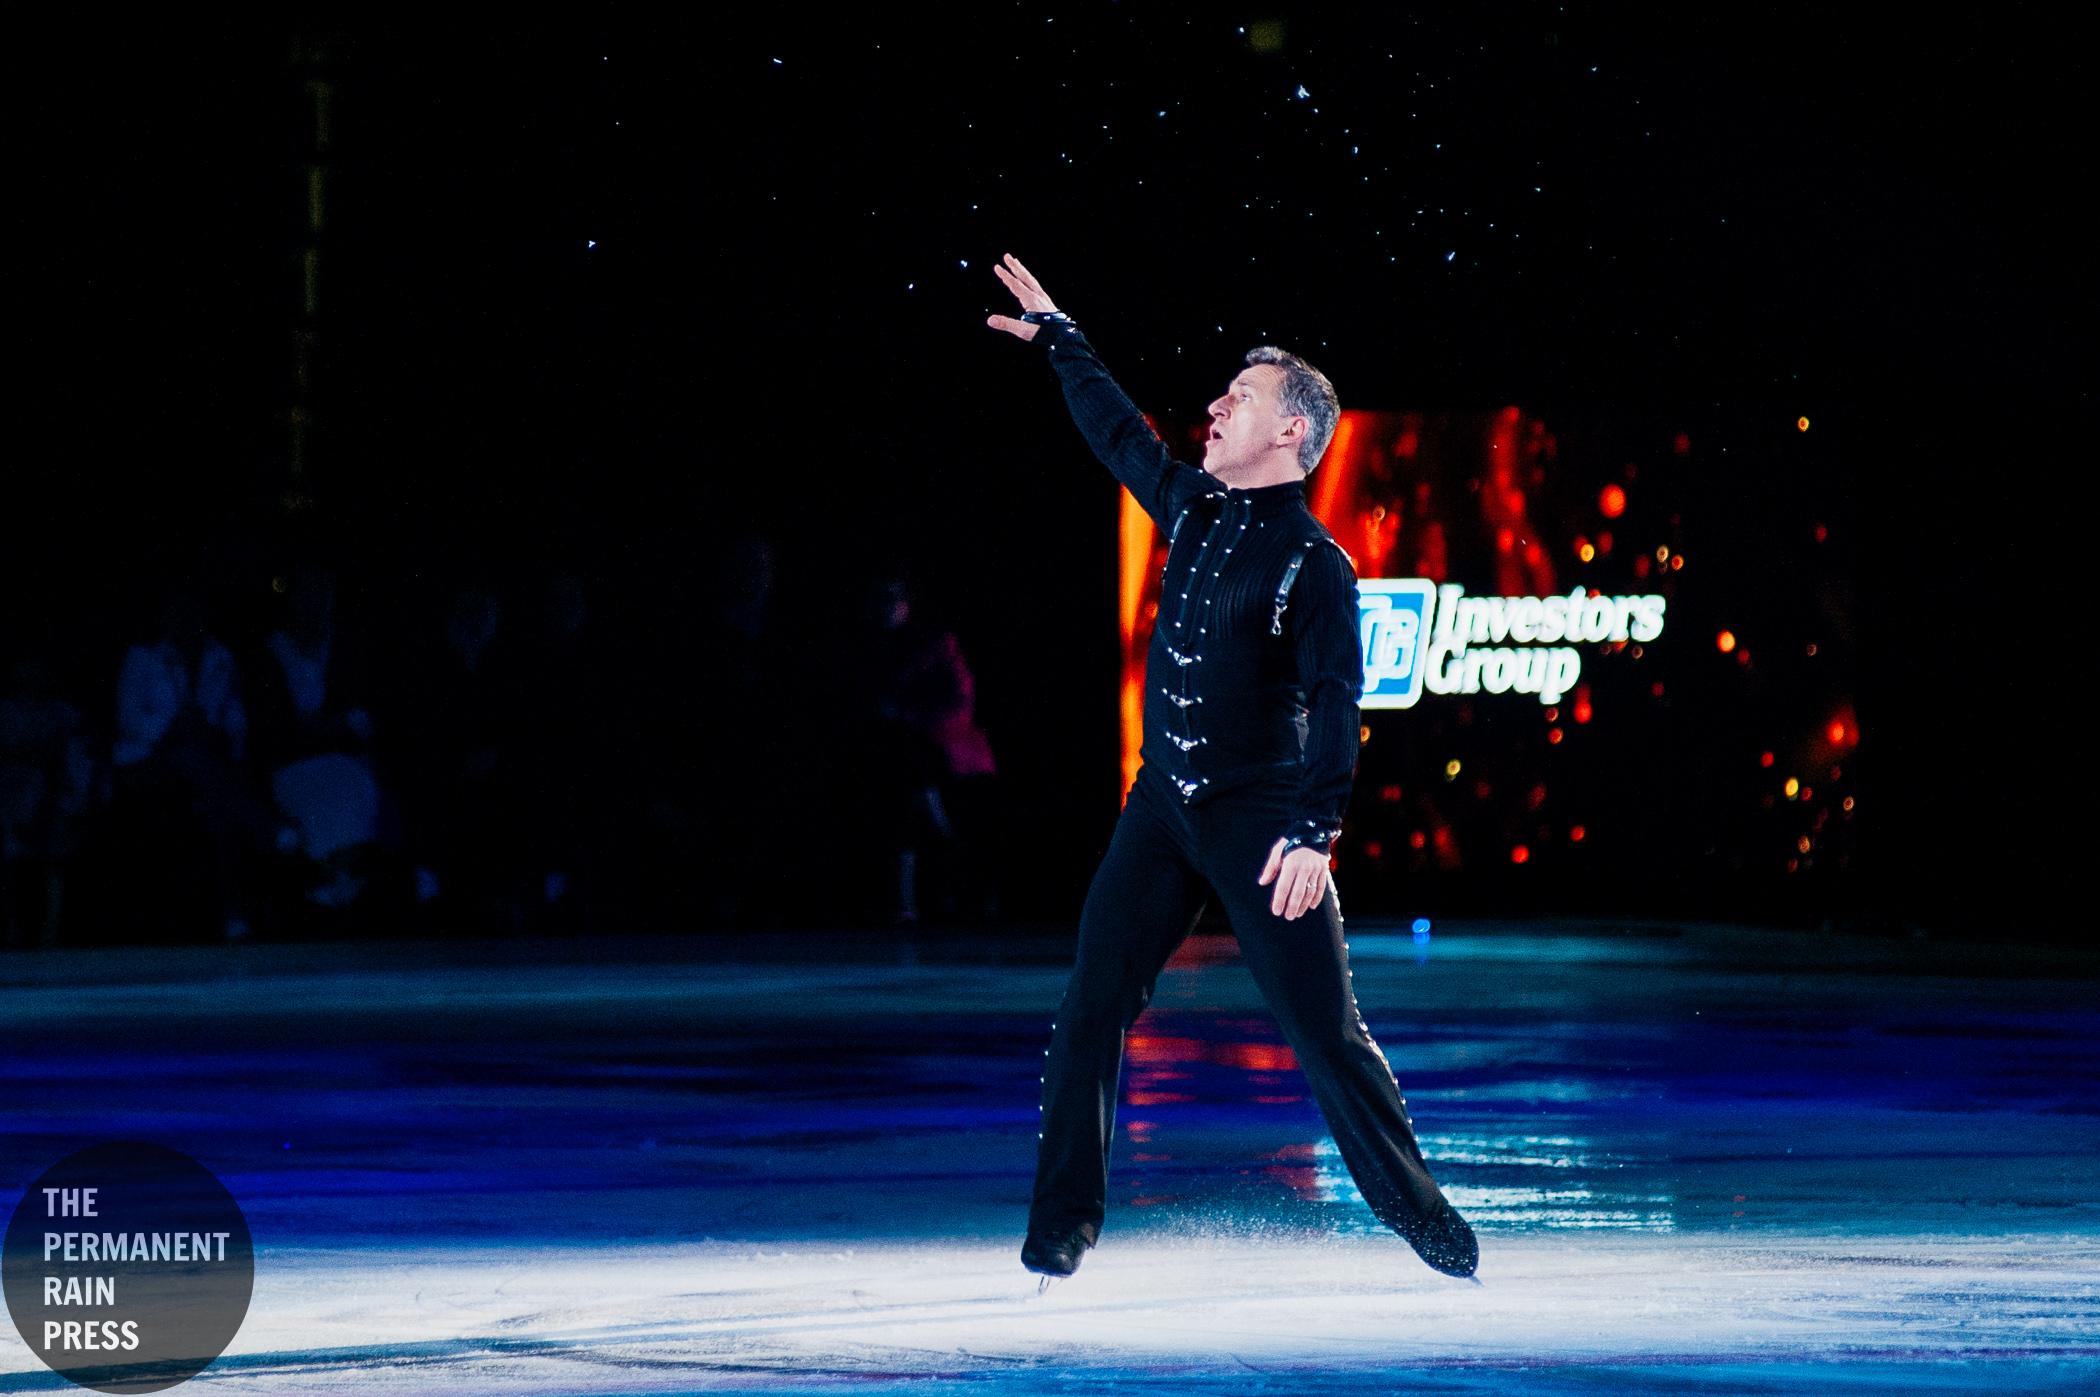 Stars_On_Ice-Rogers-Arena_Timothy_Nguyen-5.jpg